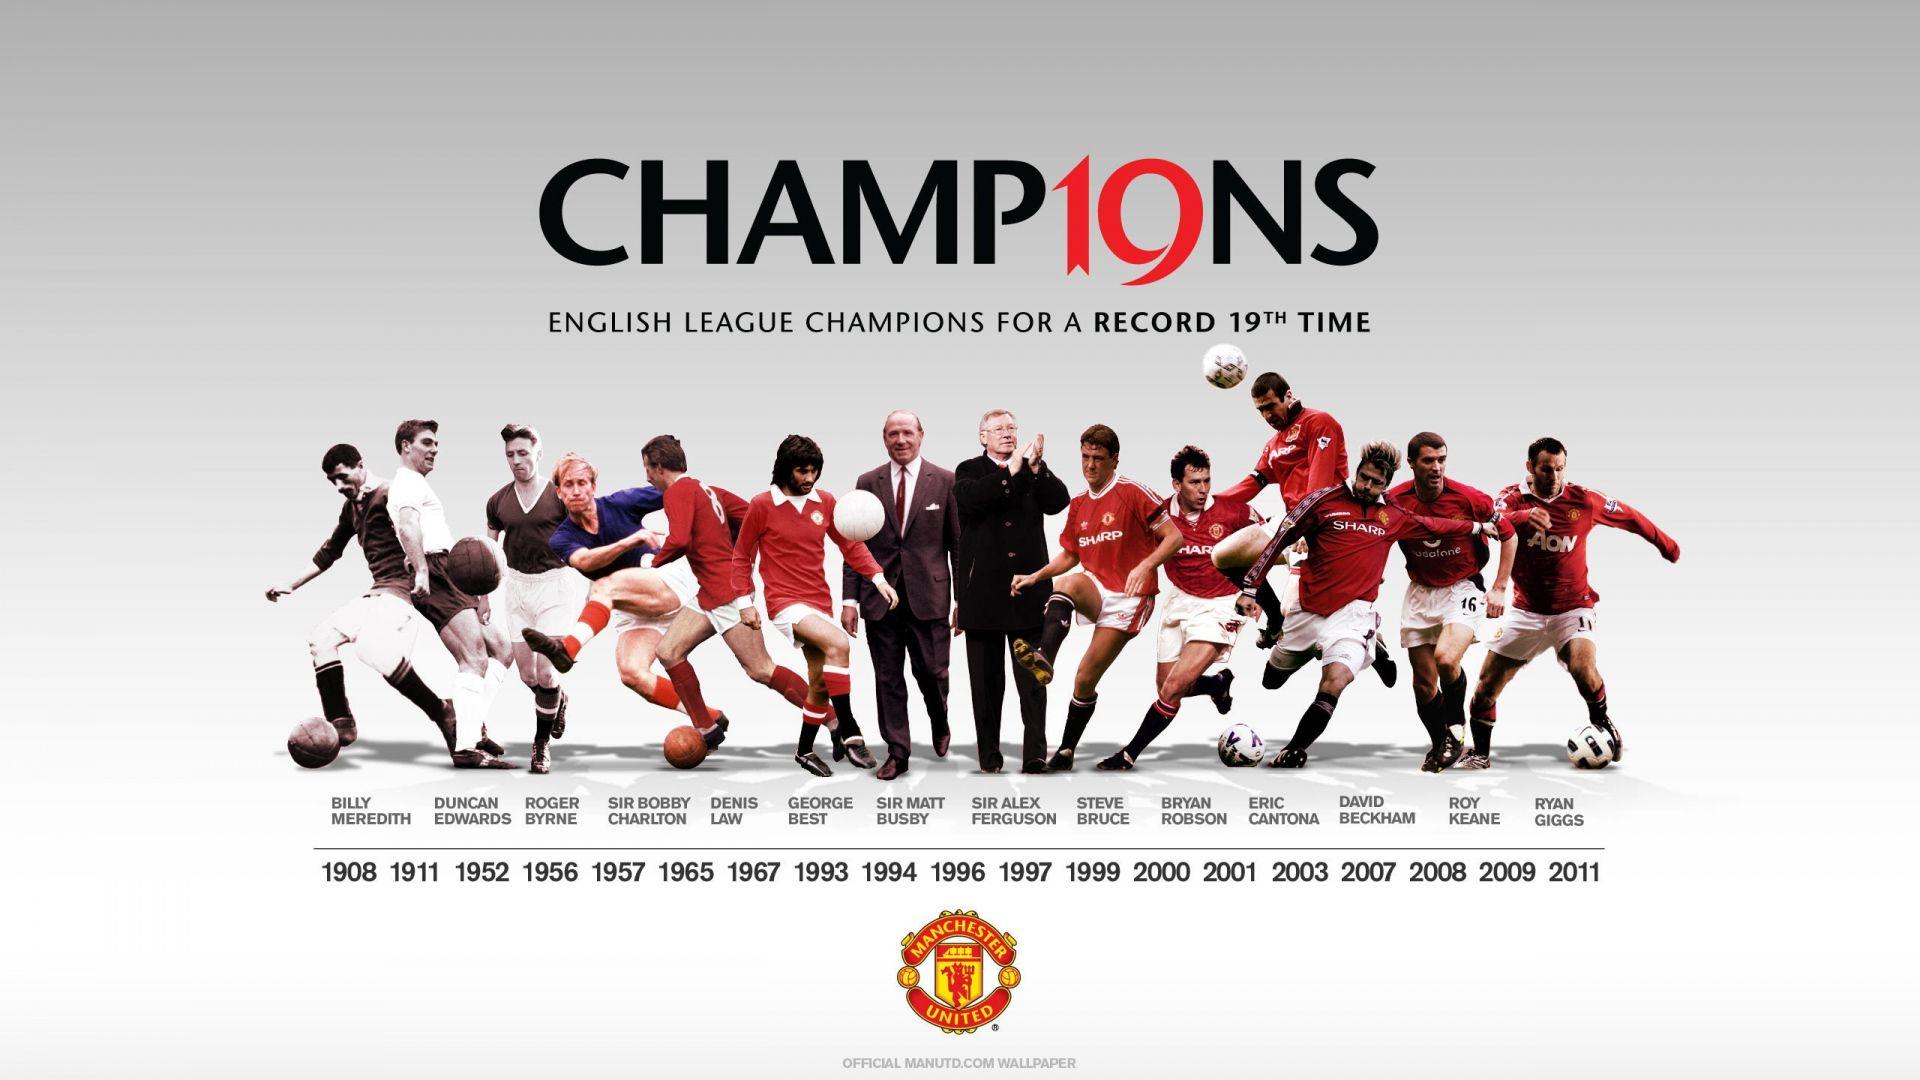 Manchester United Team Football Http Www Wallpapers4u Org Manchester U Manchester United Wallpaper Manchester United Champions Manchester United Football